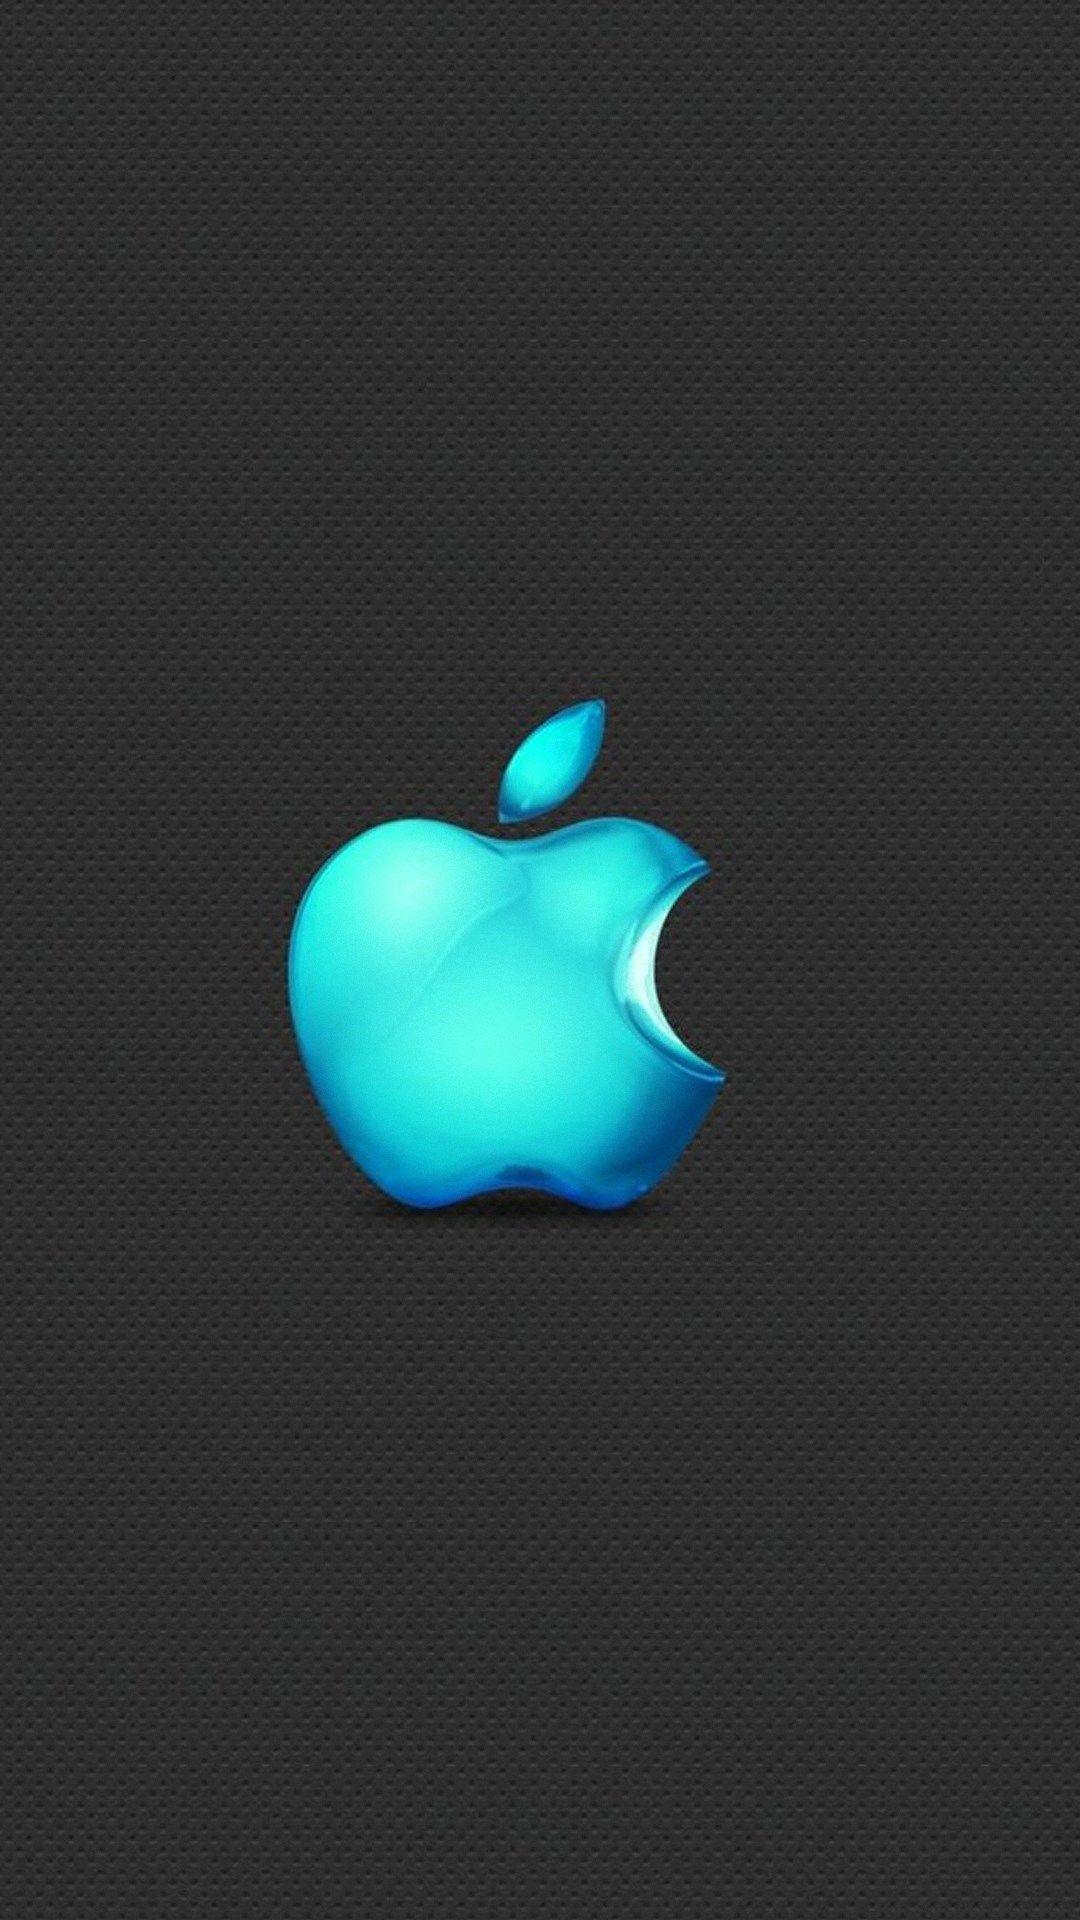 Wallpaper iphone apple logo - Apple Logo Hd Wallpaper For Iphone